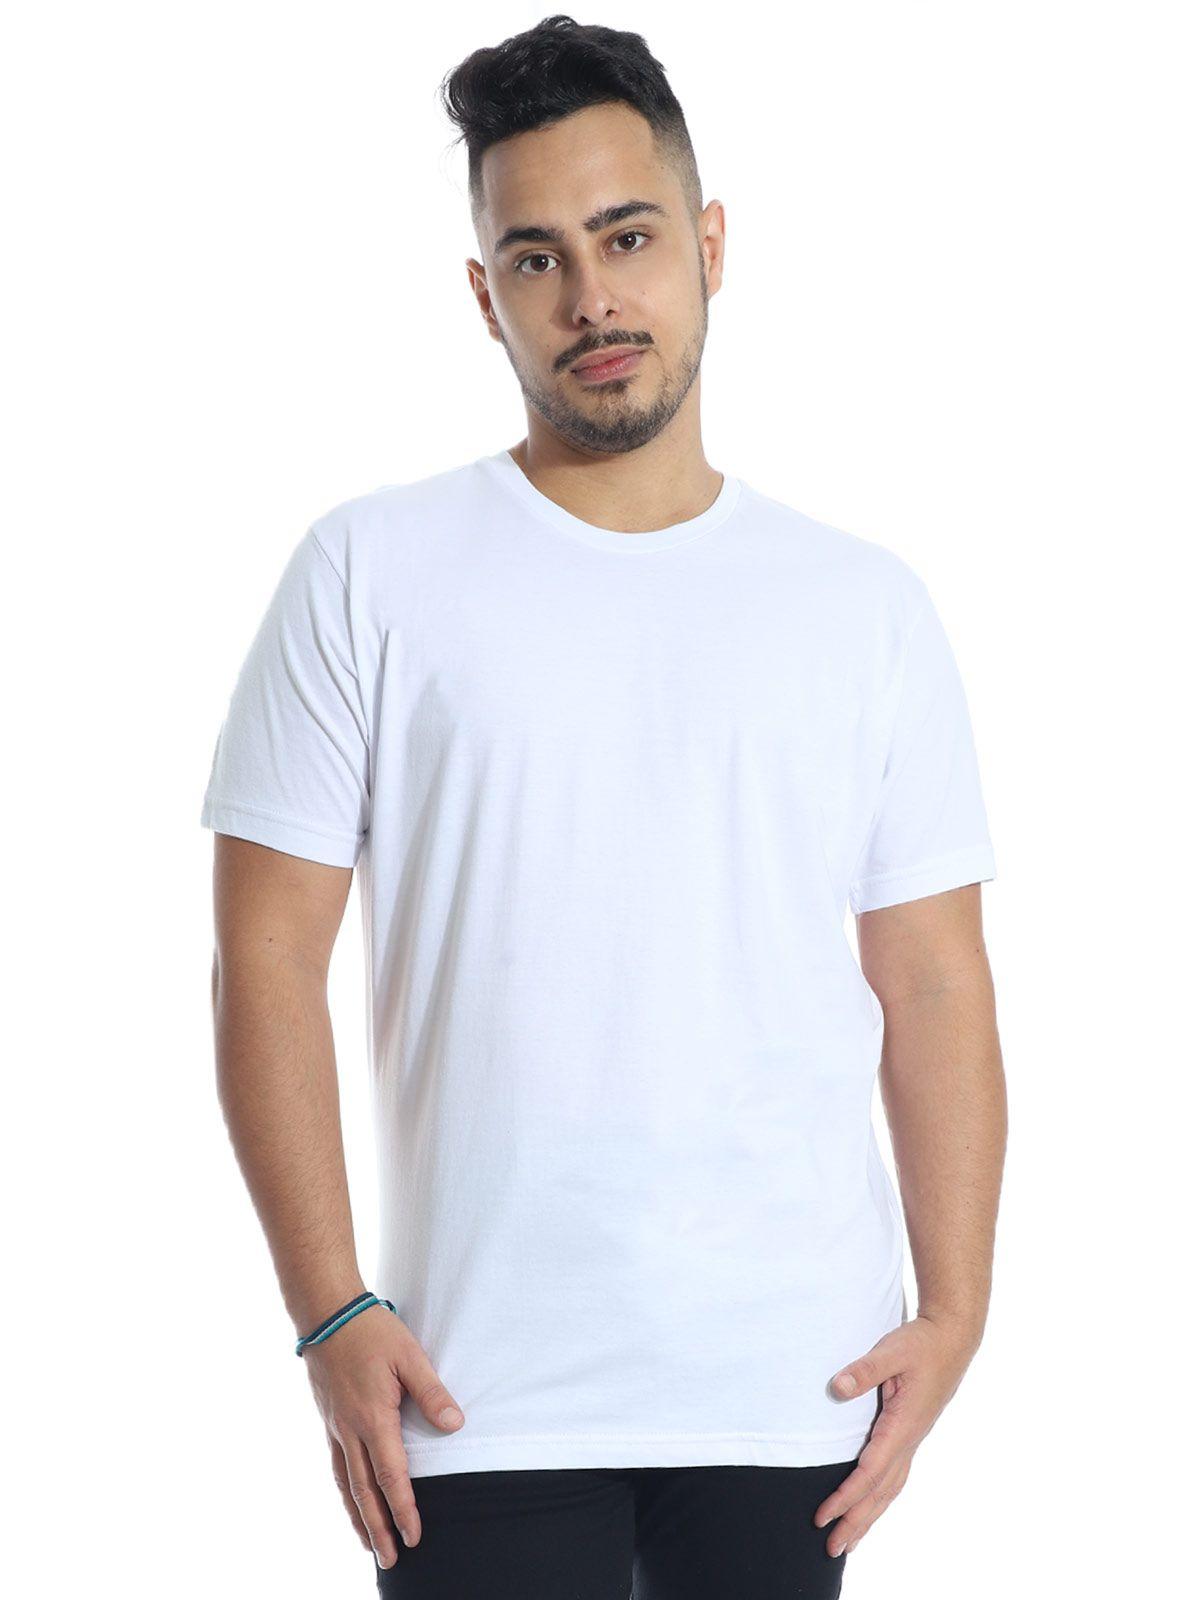 Camiseta Masculina Básica Lisa Branco